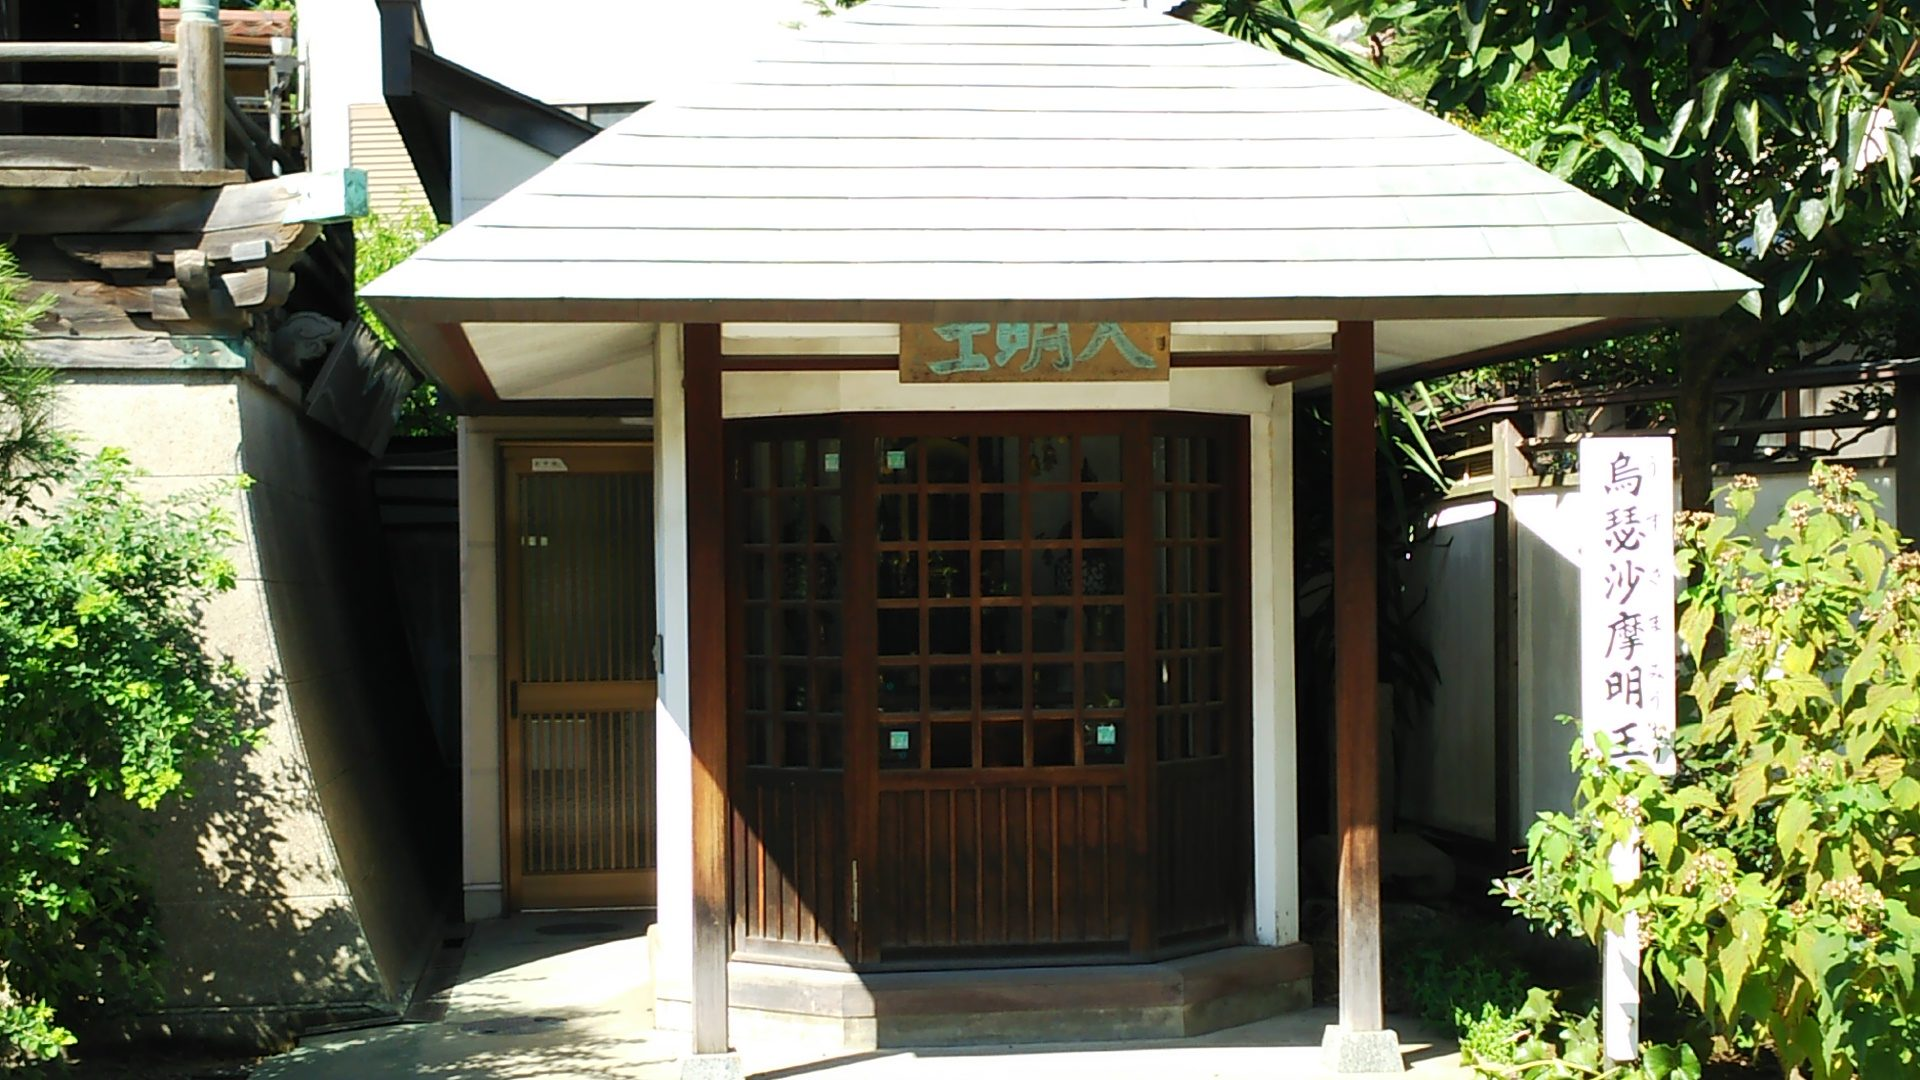 烏枢沙摩(Ususama)